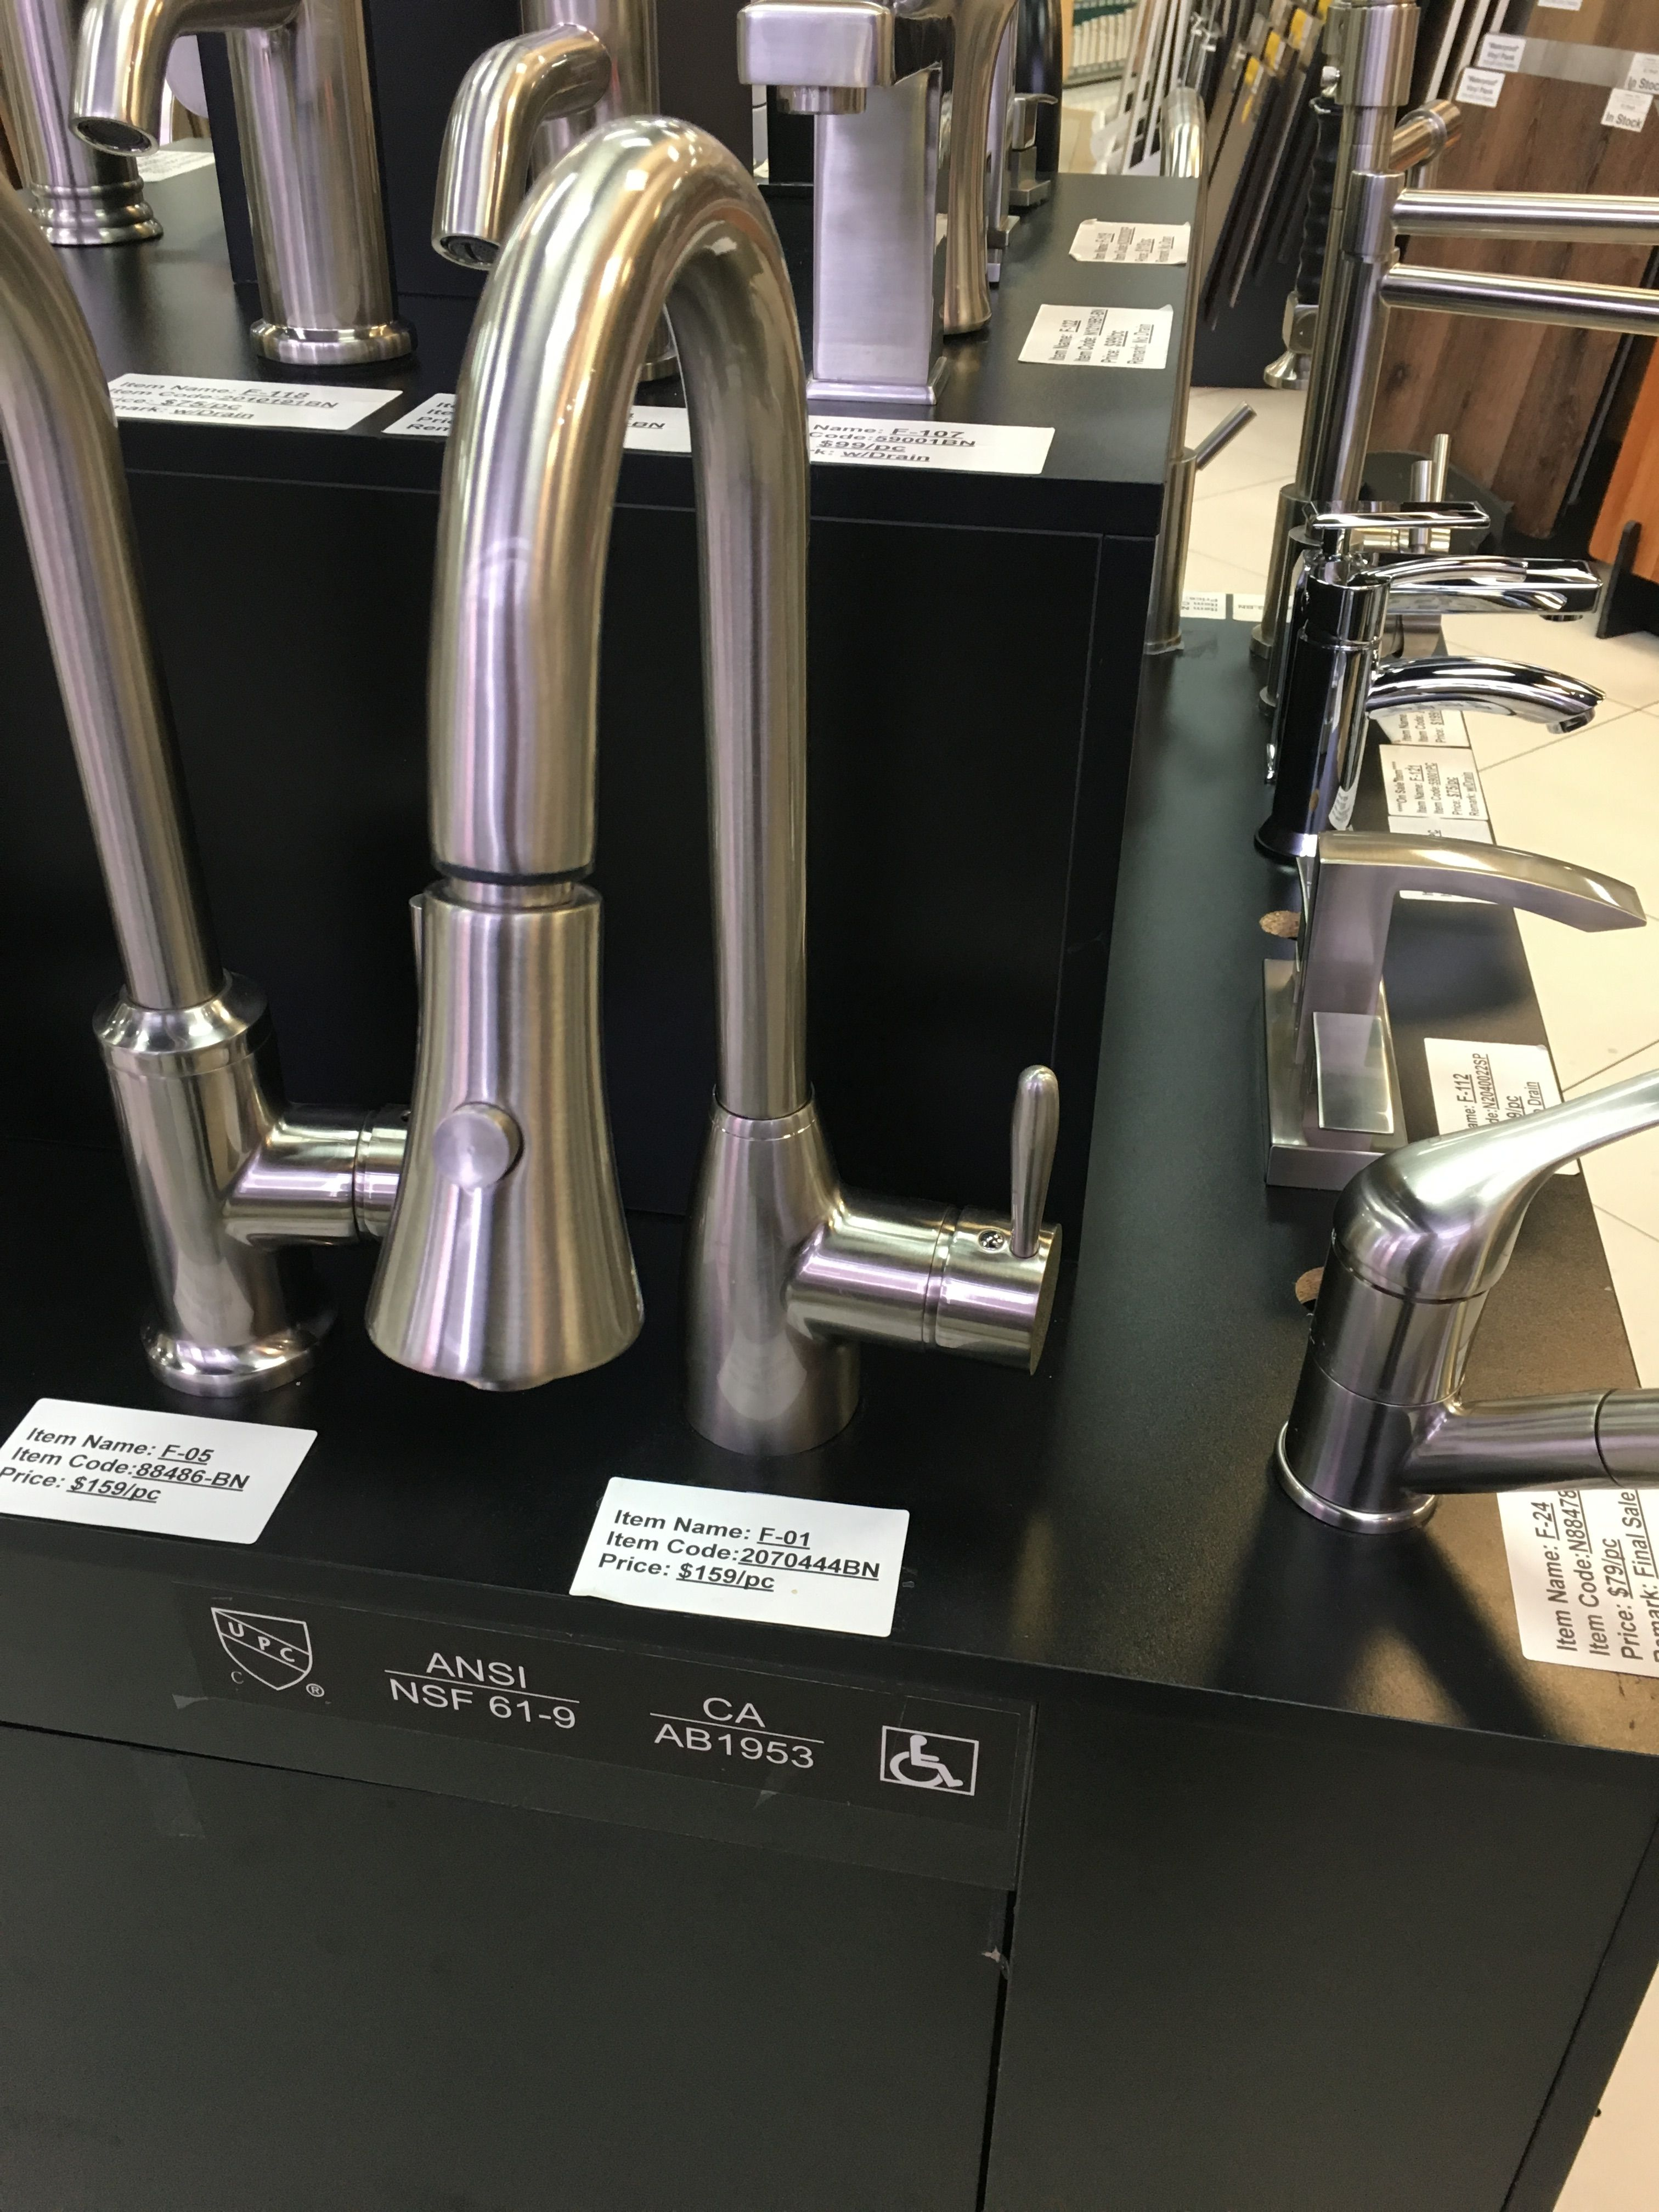 Faucet faucet espresso machine coffee maker